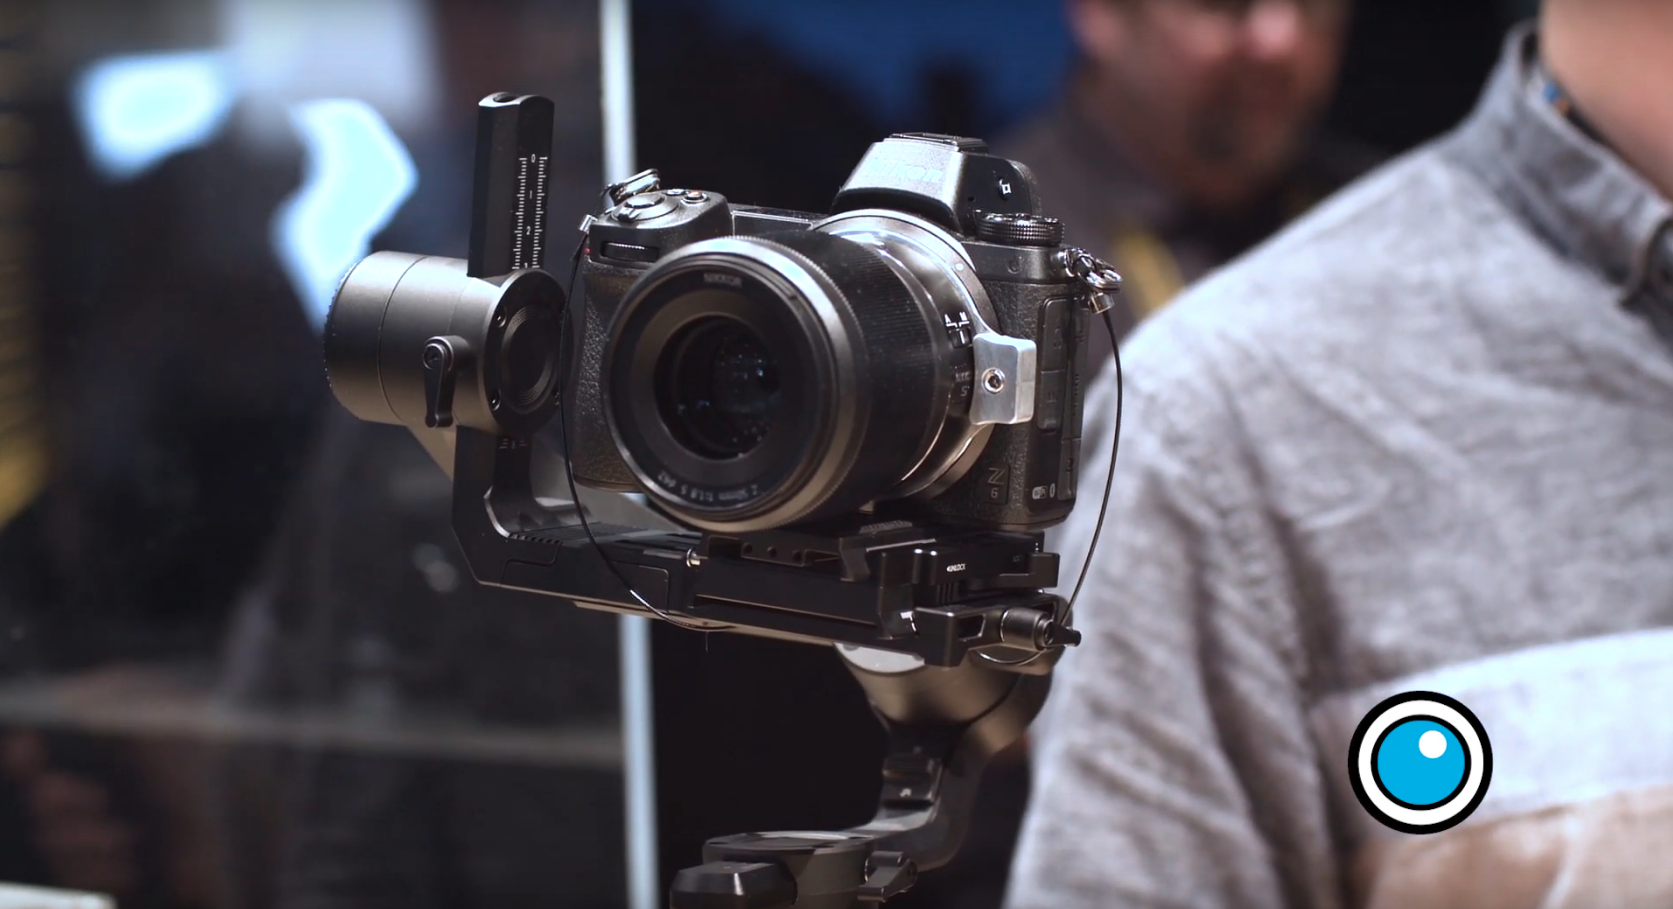 NAB 2019: Nikon Talks New Mirrorless Cameras Z7 and Z6